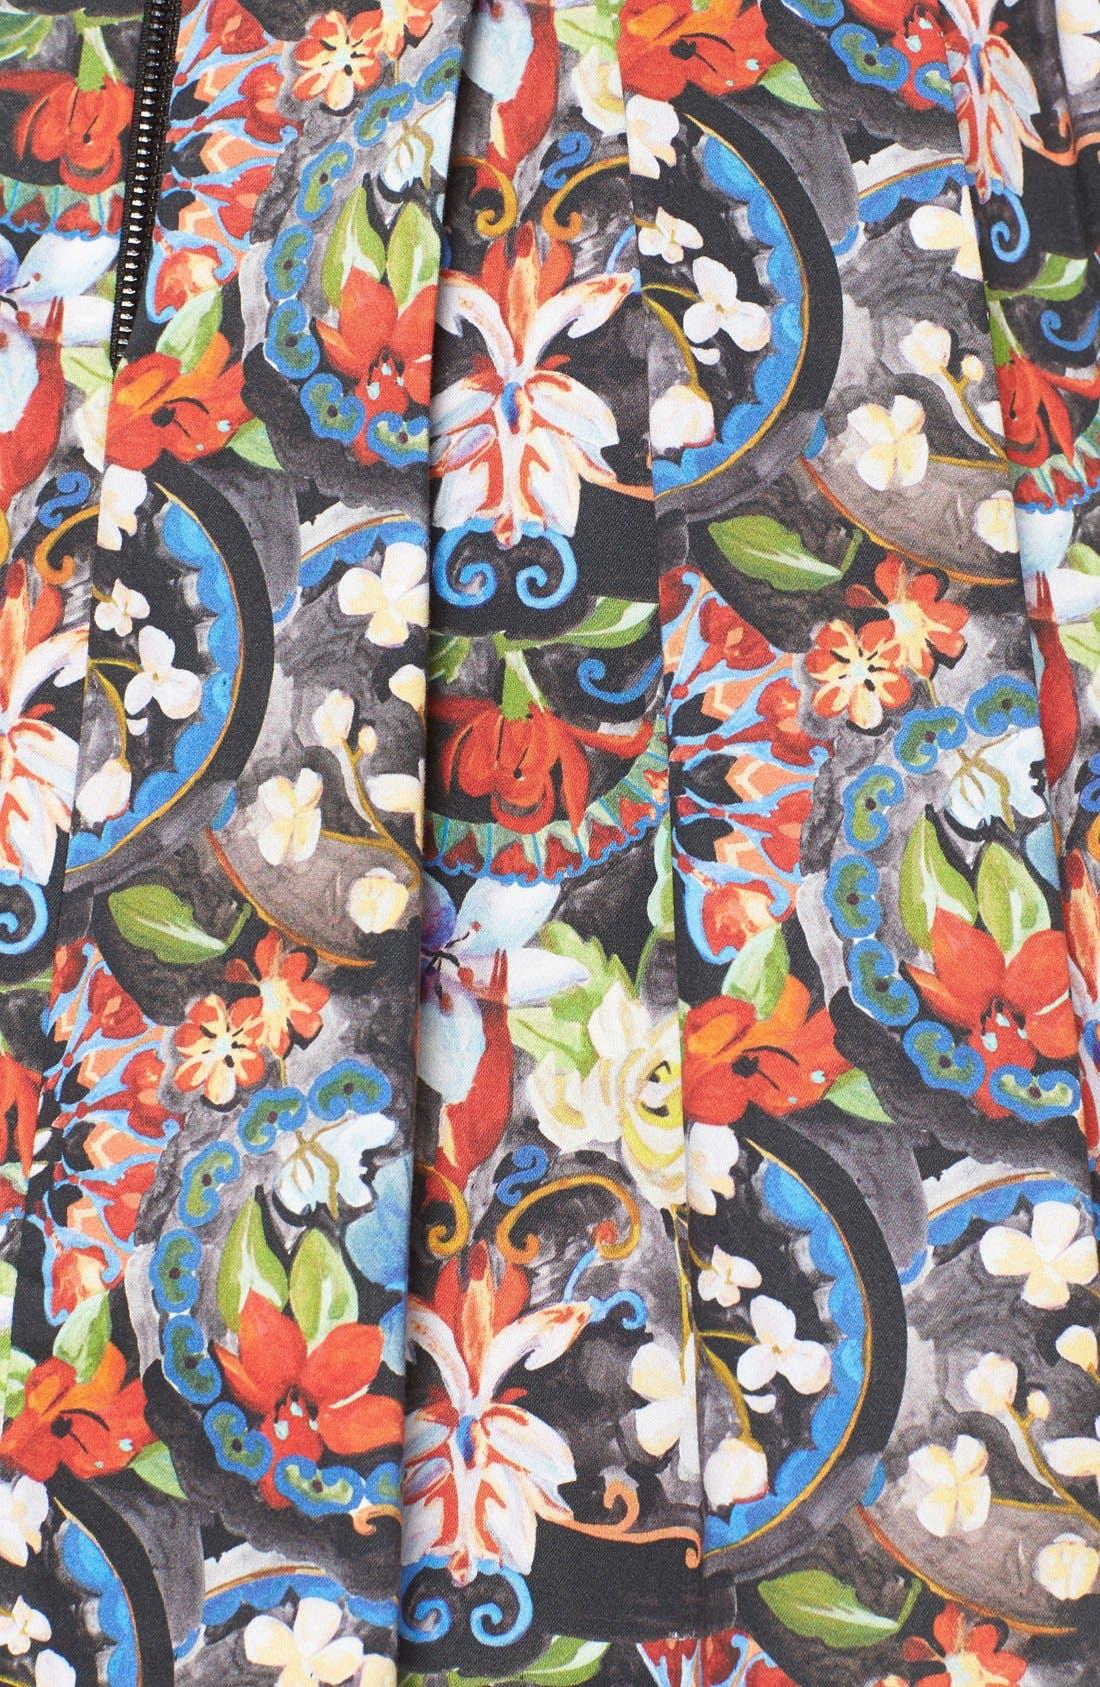 ALICE + OLIVIA, 'Parson' Floral Print Pleated Miniskirt, Alternate thumbnail 4, color, 605